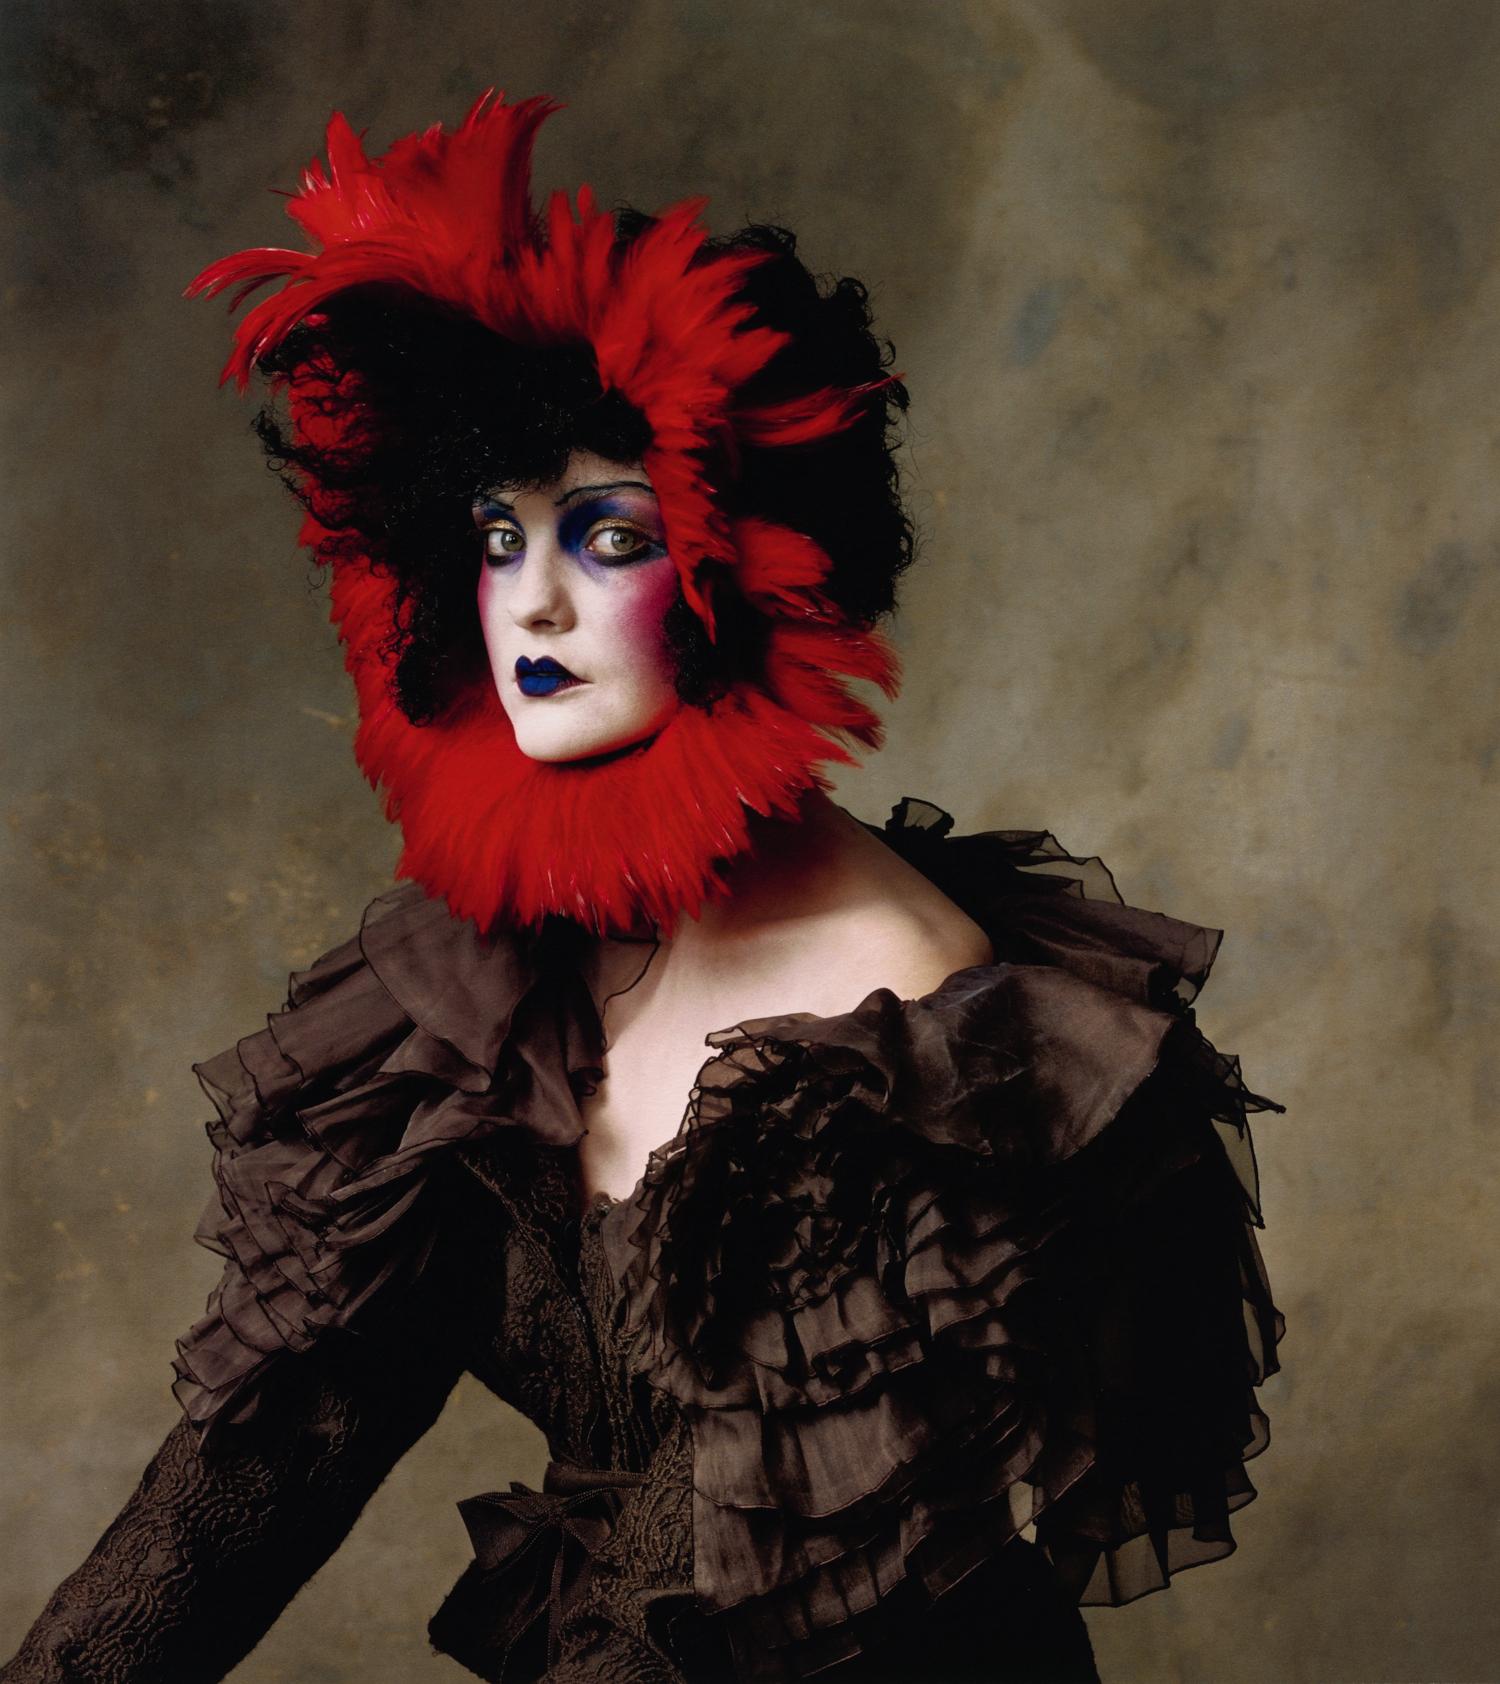 John Galliano Silk Wool Jacquard Jacket with Red Feather Headpiece , New York, 2007 Inkjet print © Condé Nast